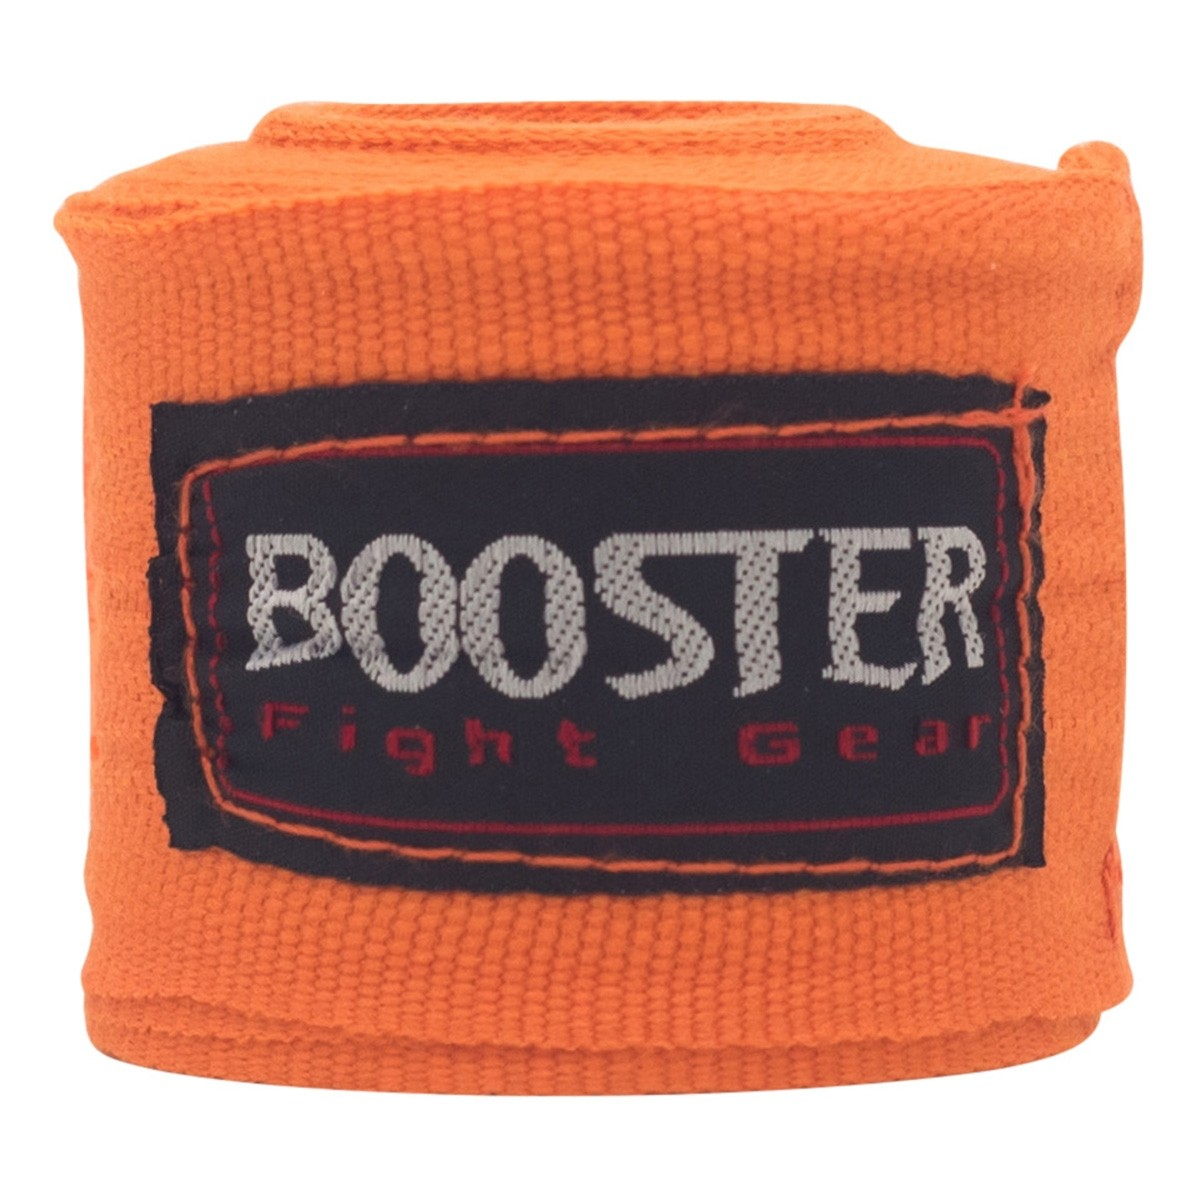 Booster bandage fluo oranje 460cm - jokasport.nl